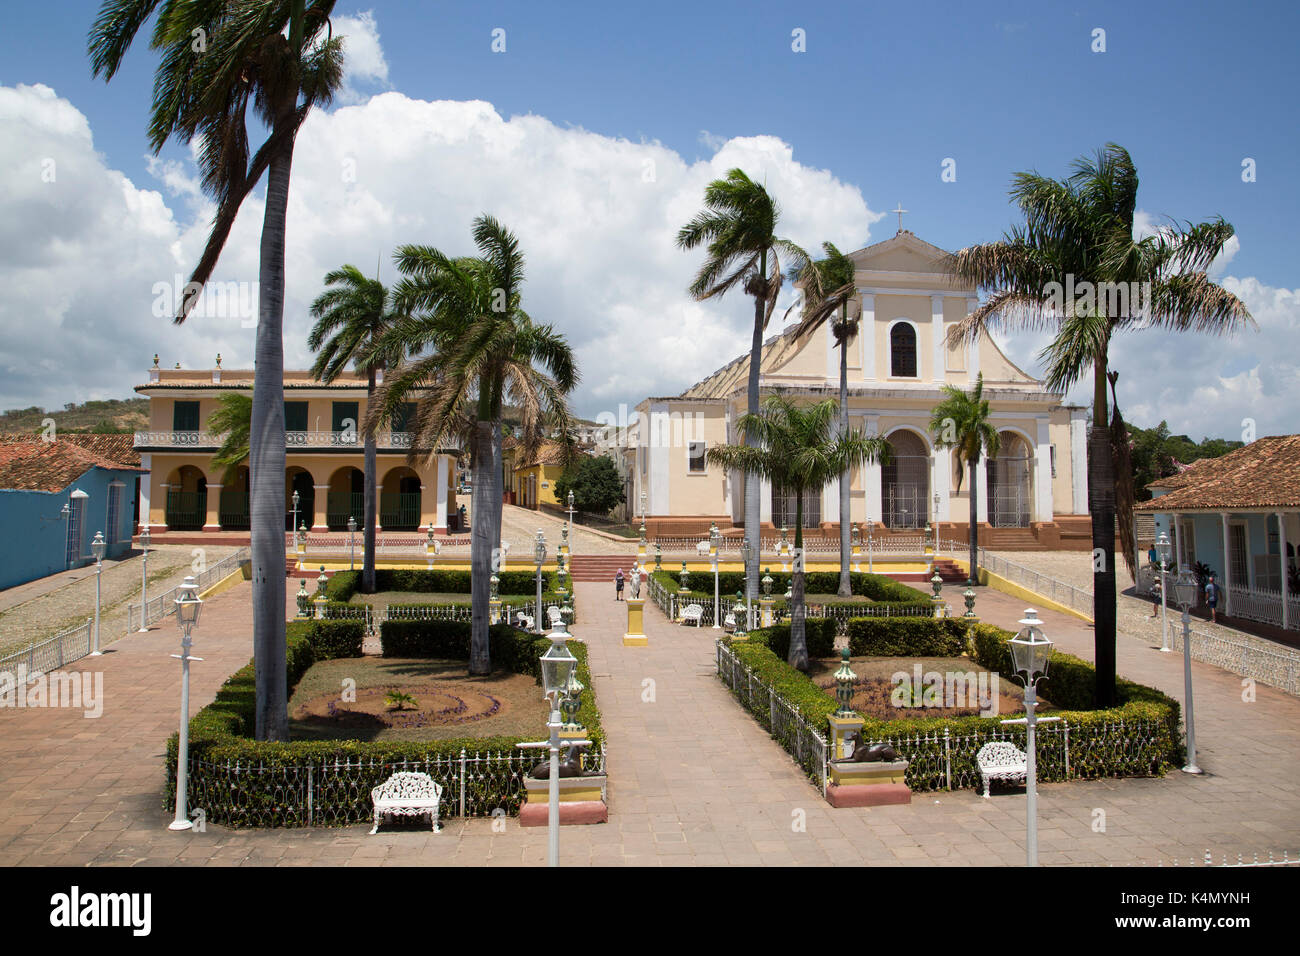 Iglesia Parroquial de la Santisima Trinidad, Plaza Mayor, Trinidad, UNESCO World Heritage Site, Sancti Spiritus, Cuba, West Indies, Central America - Stock Image